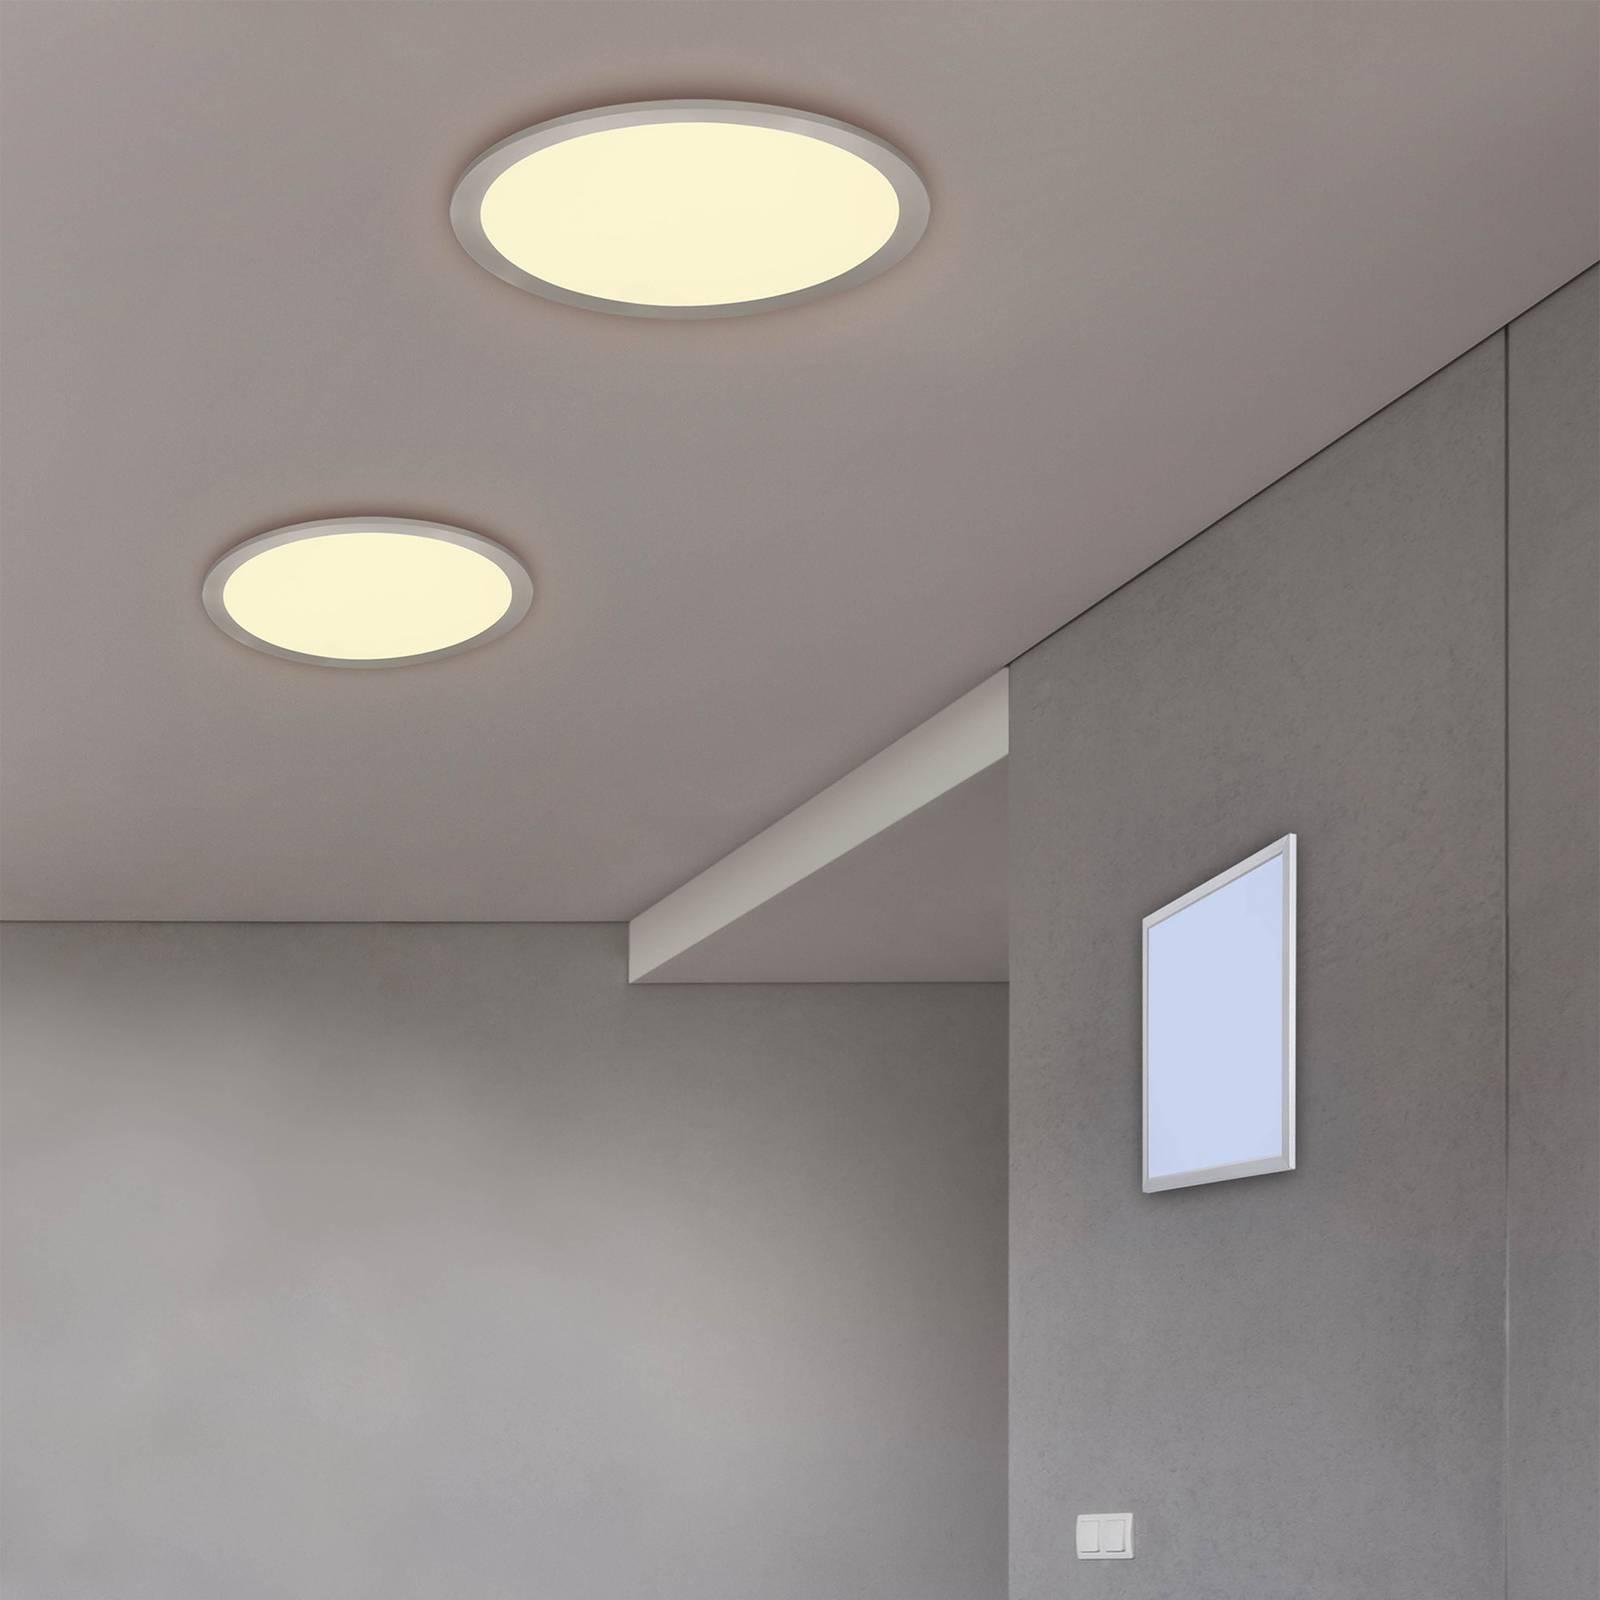 LED-kattovalaisin Alima, CCT, WiZ, Ø 50 cm